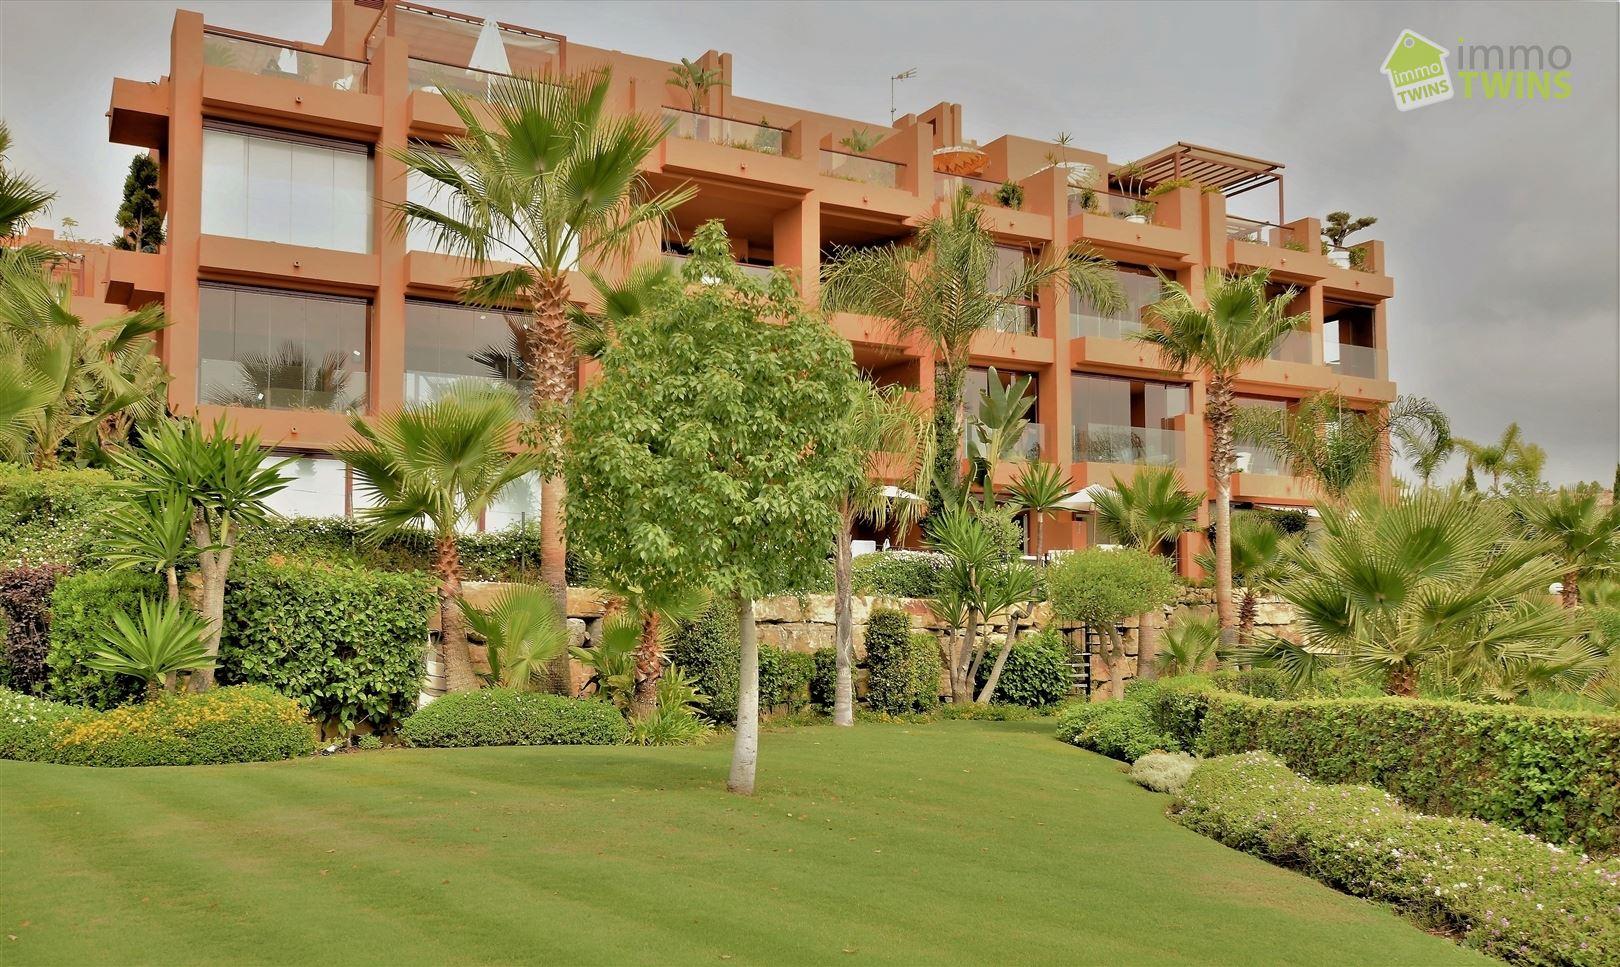 Foto 1 : Appartement te 29679 MARBELLA (Spanje) - Prijs € 485.000